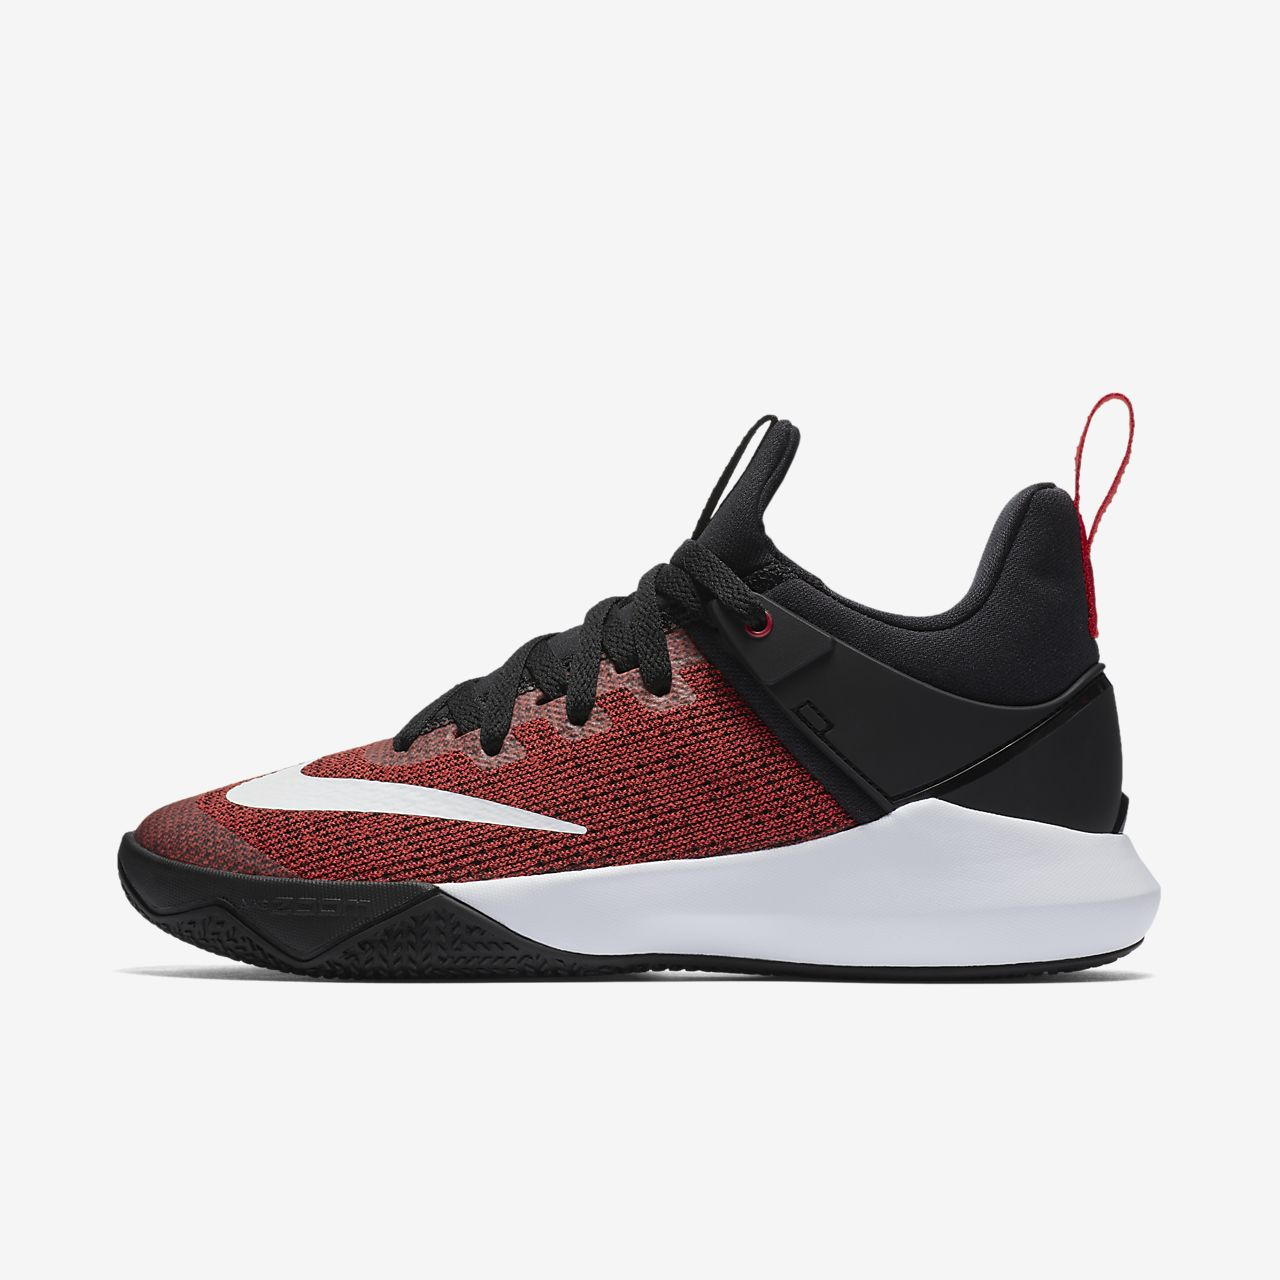 nike shoes zoom shift shoes change color 910420